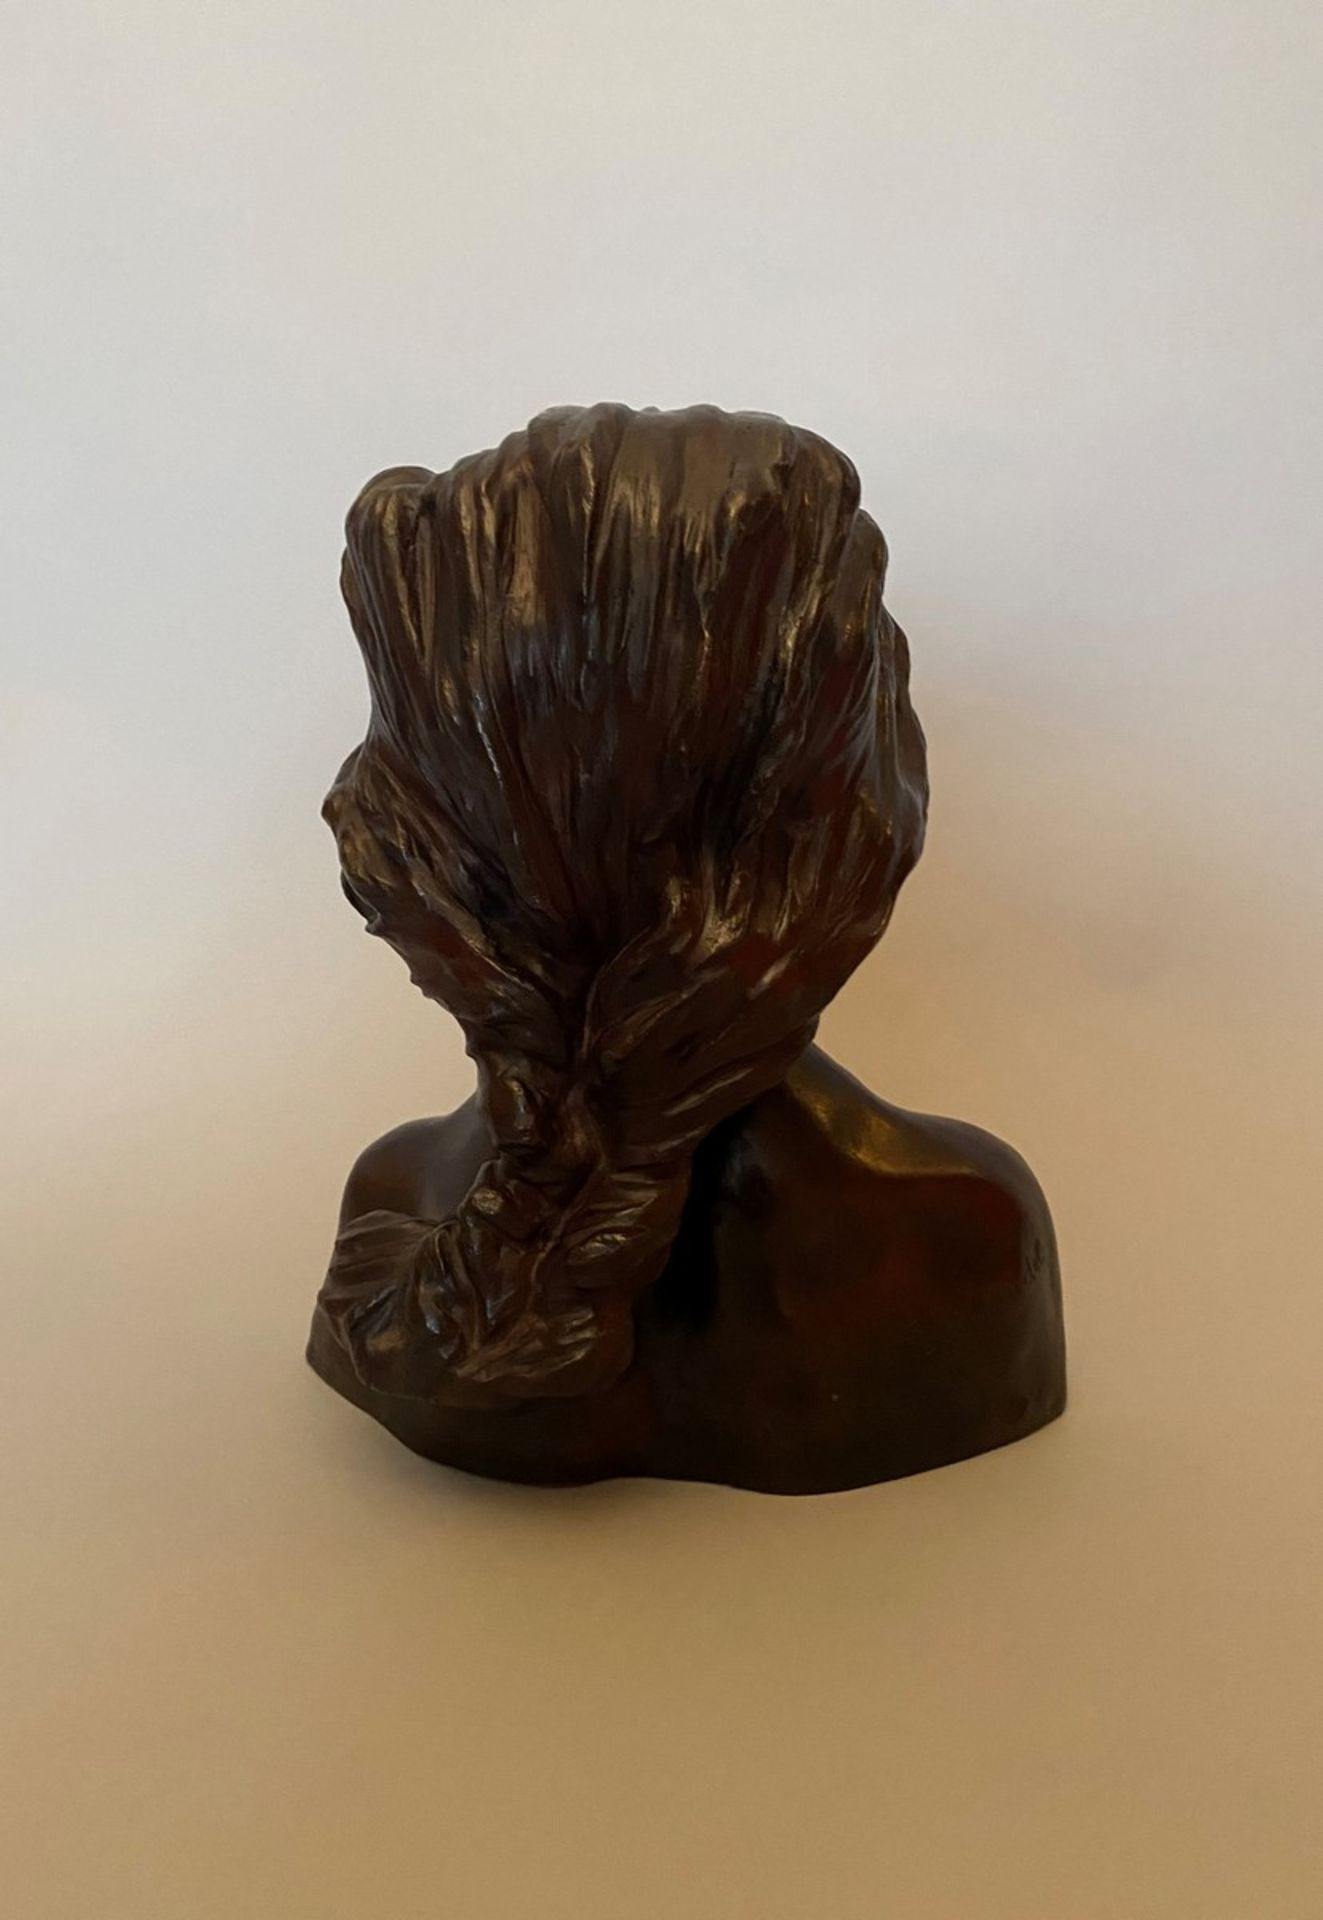 Camille CLAUDEL (1864-1943) - Image 3 of 3